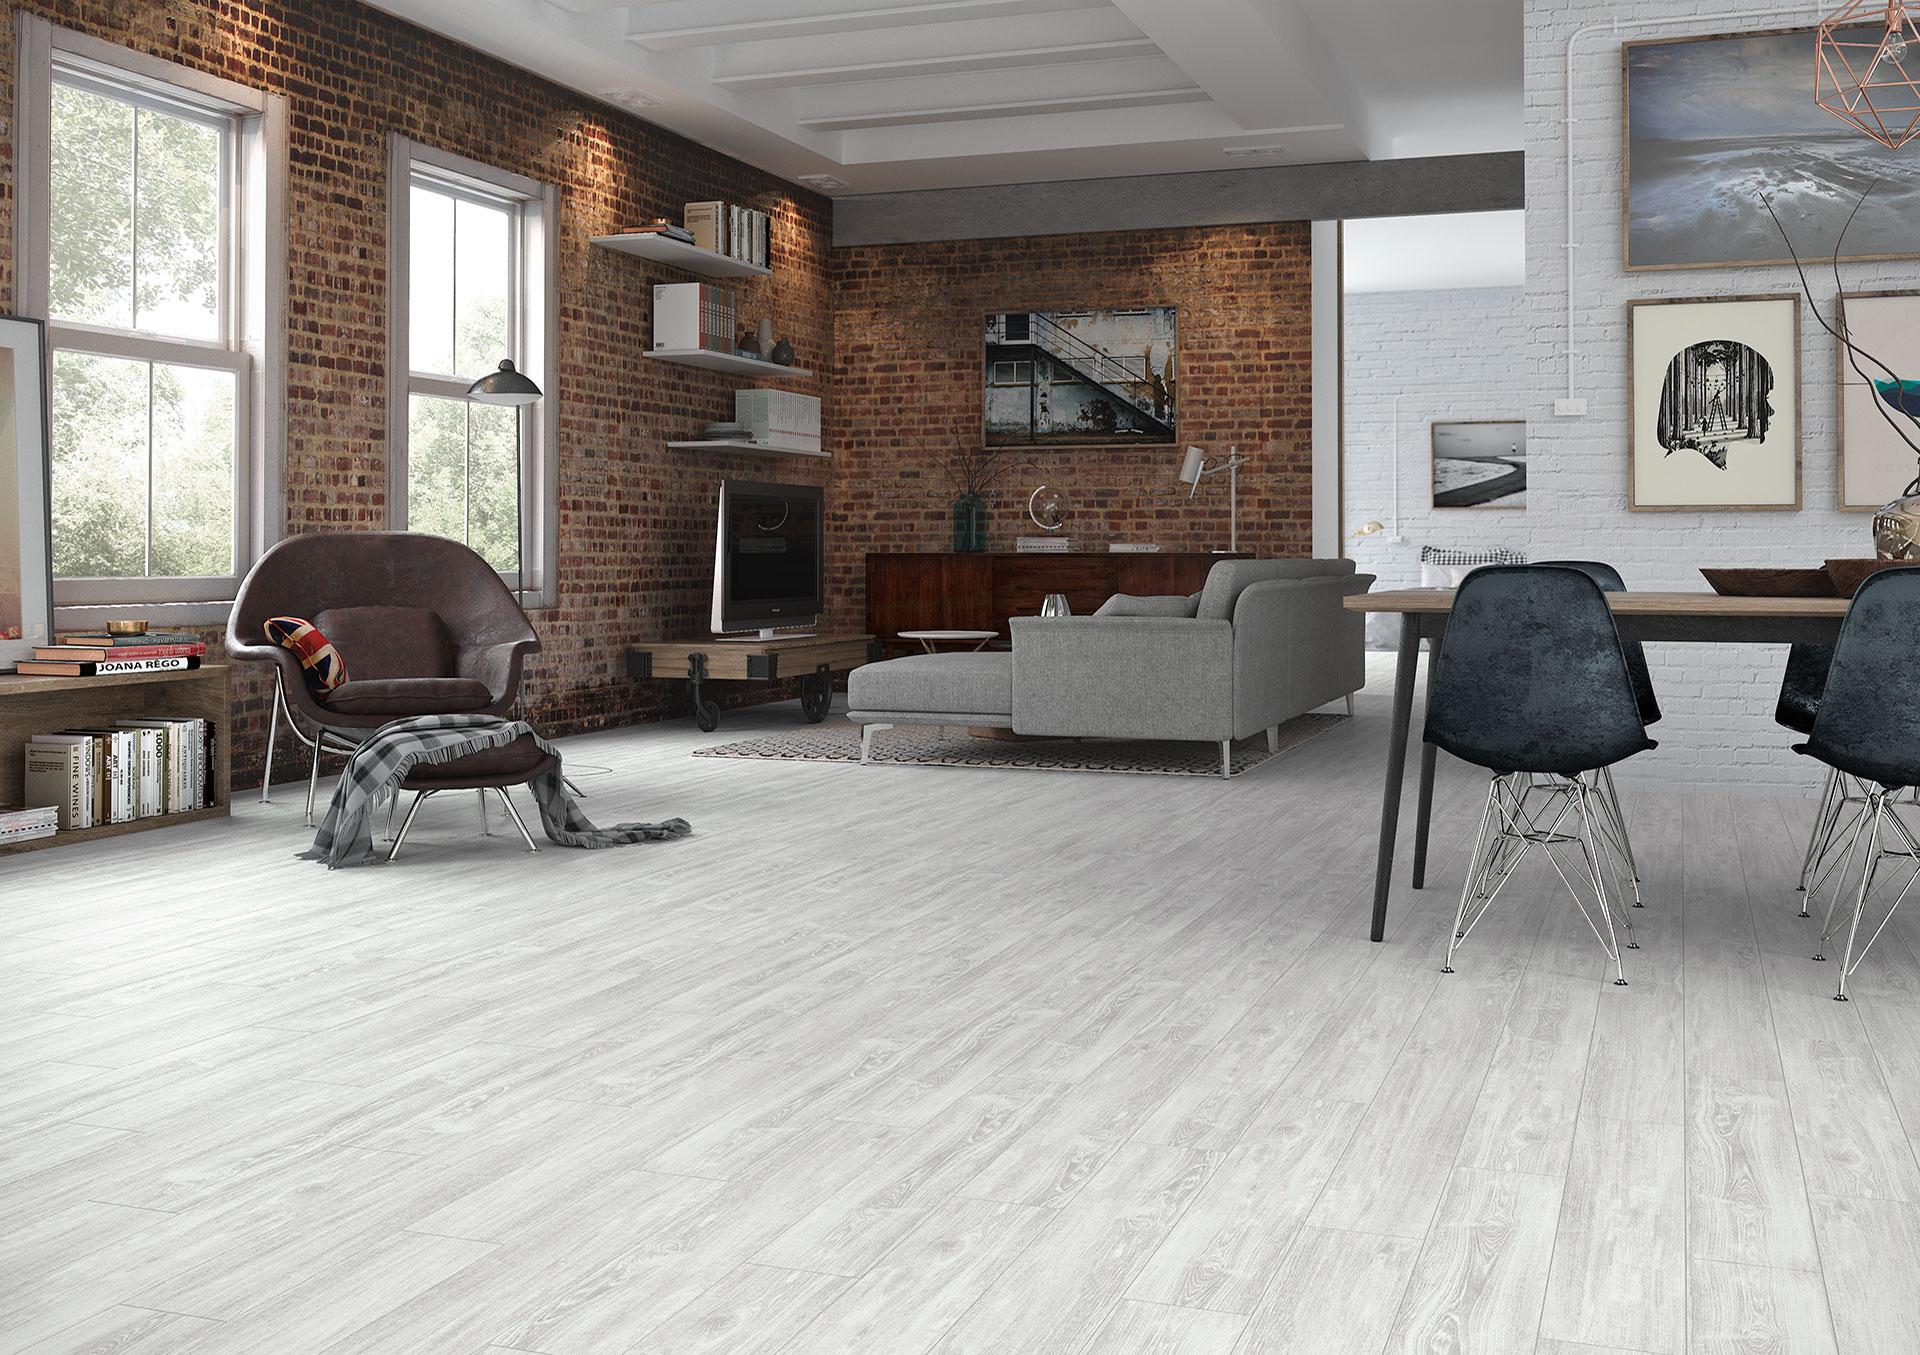 Azulejos-gres-porcelanico-Pavimento-Revestimiento-lakeland_imitacion_madera